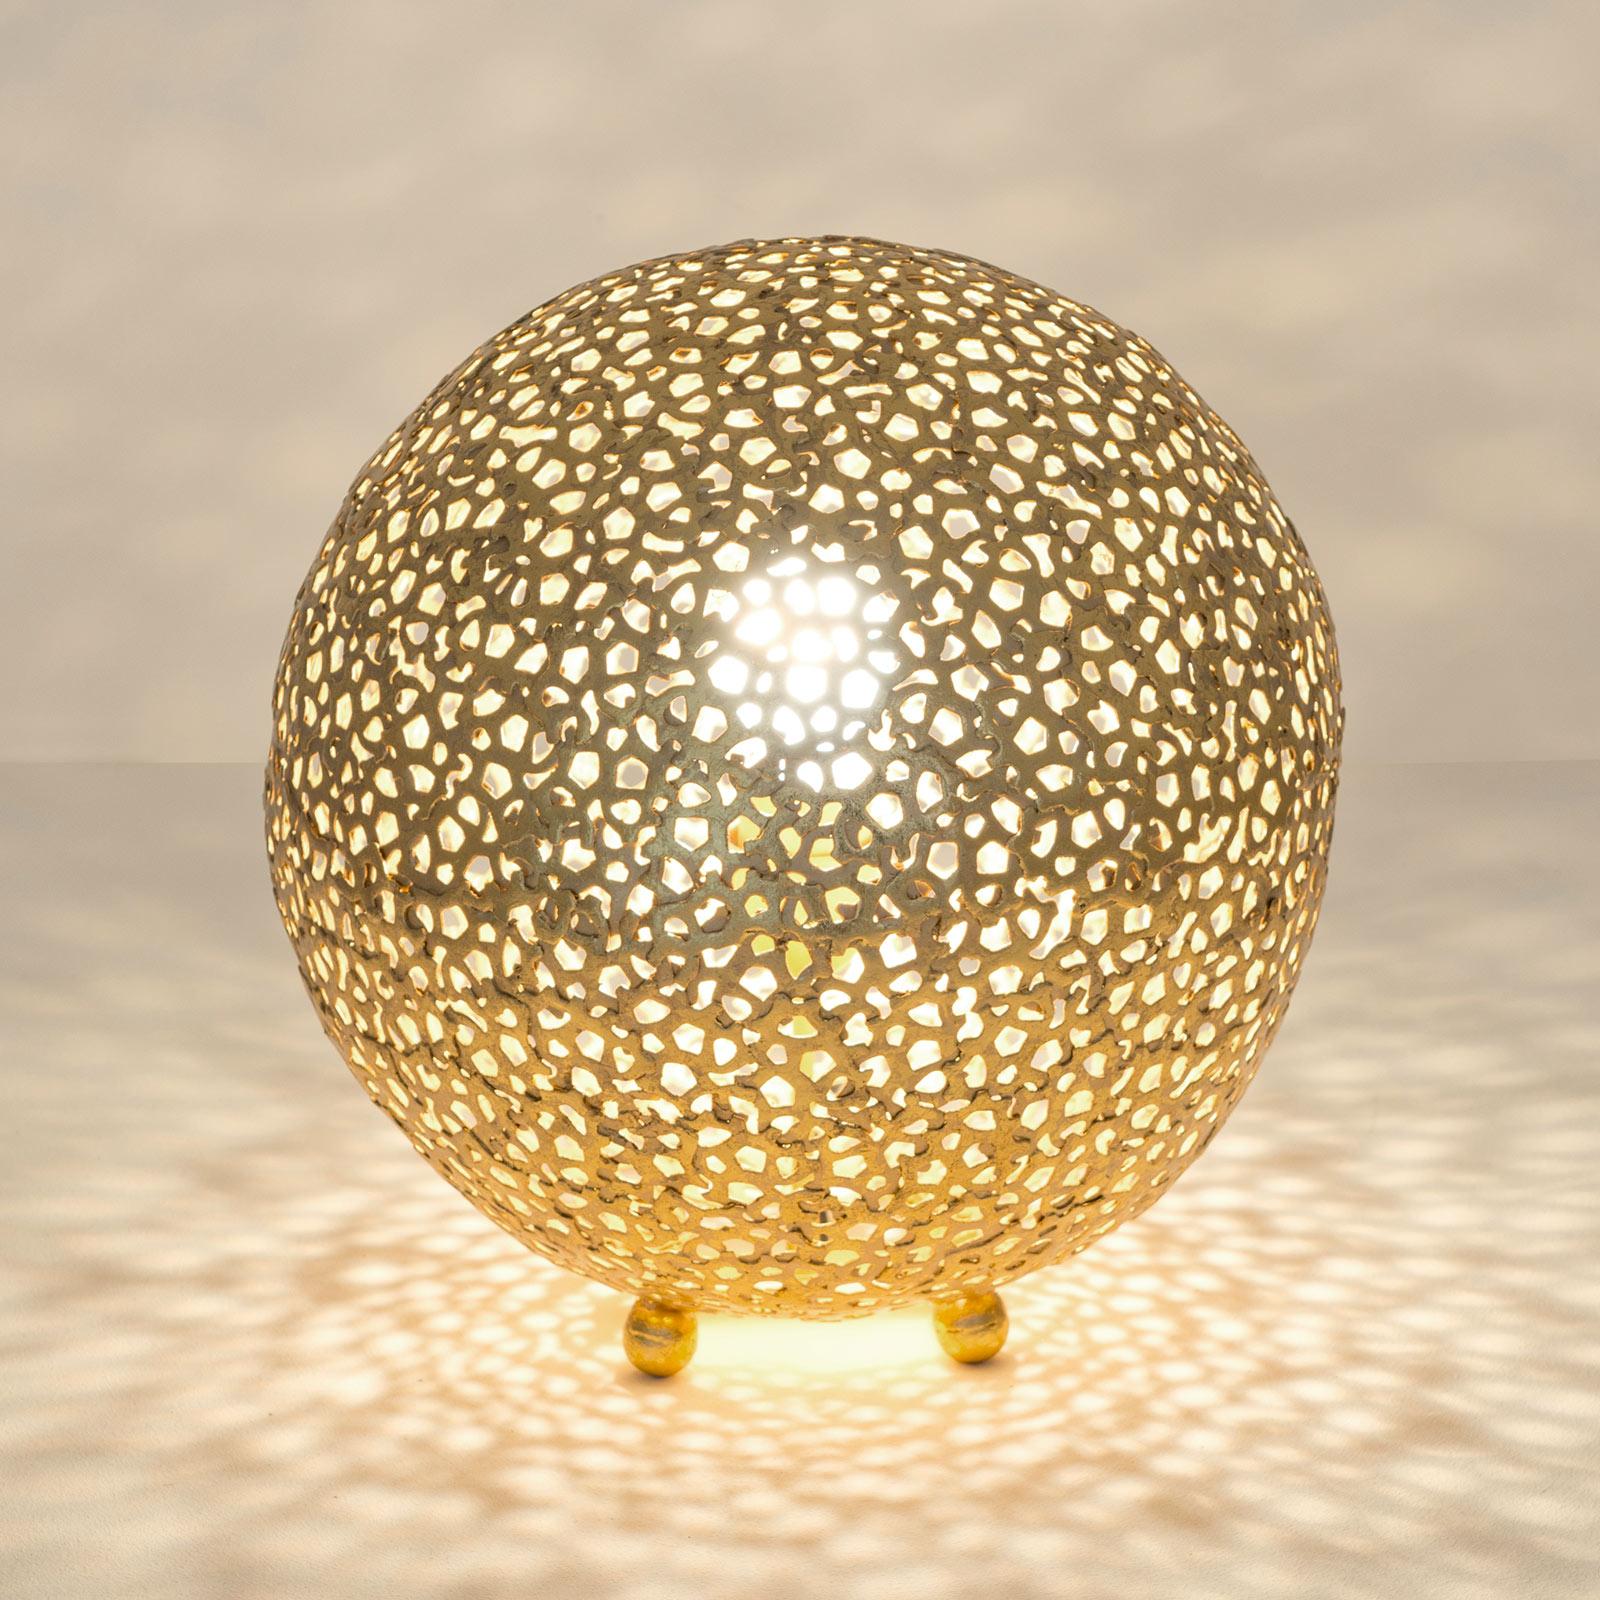 Tafellamp Lily Piccolo, Ø 33 cm, goud